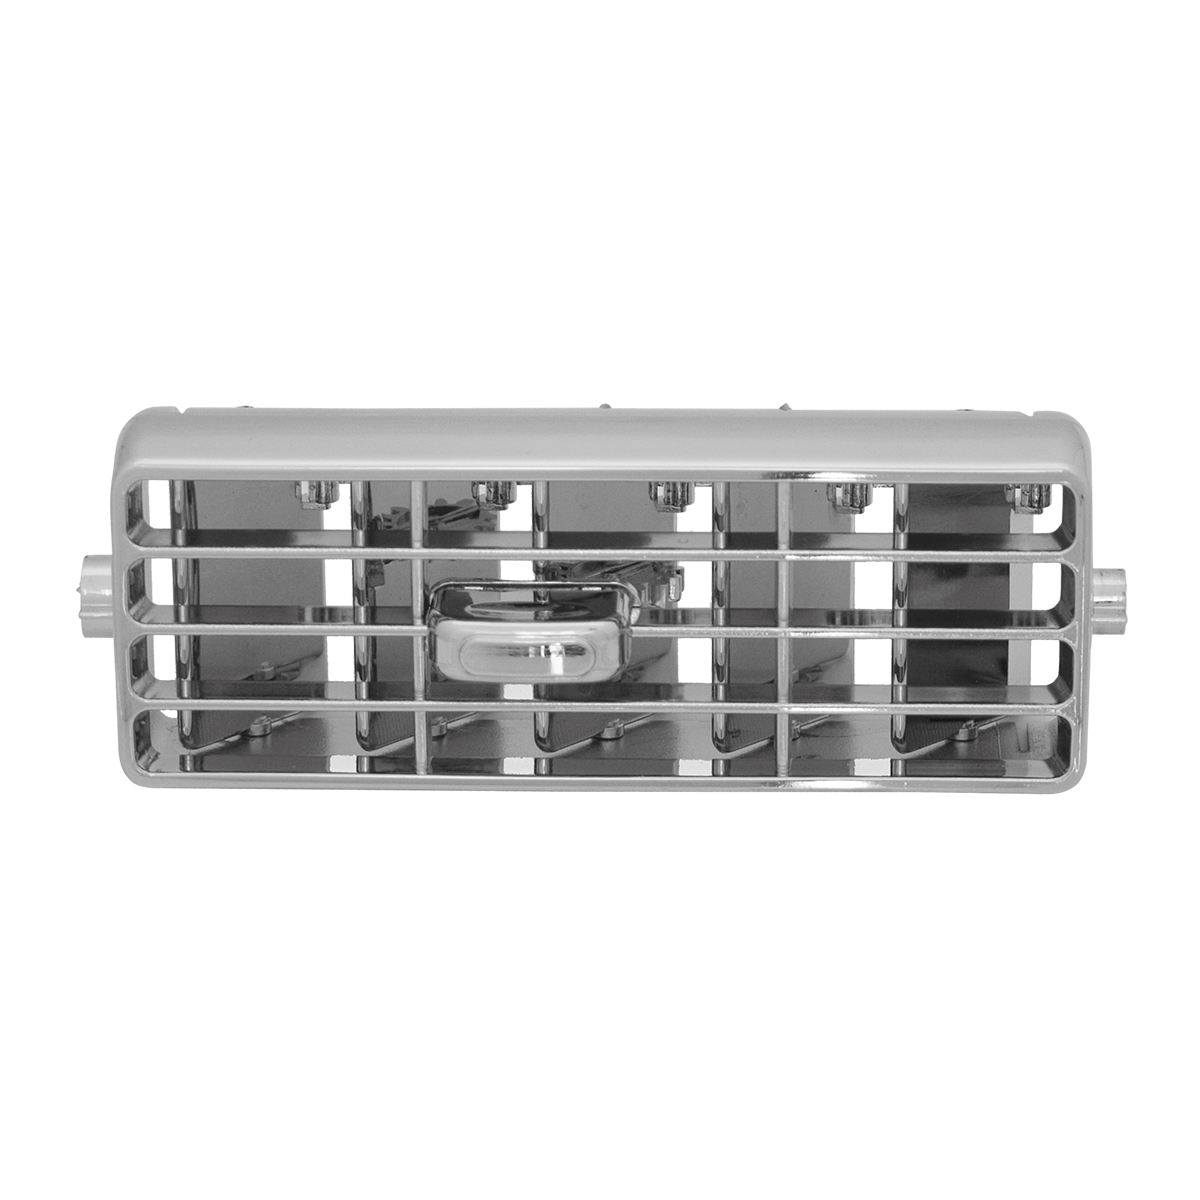 67915 Chrome Plastic A/C Vent w/ Adjustable Louver for KW